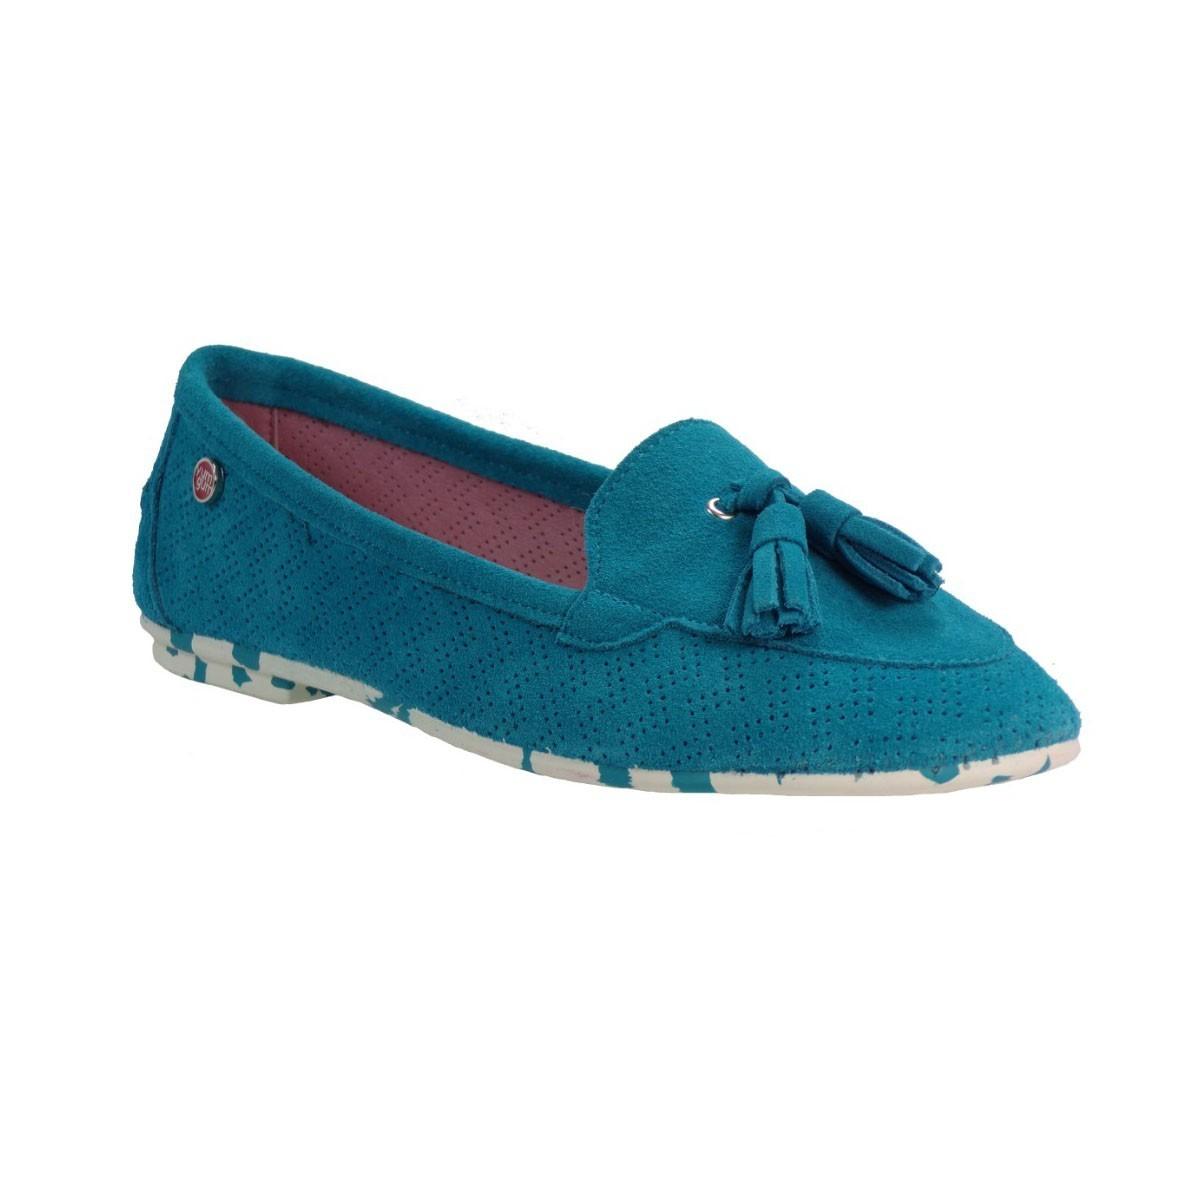 yum gum Γυναικεία Παπούτσια Mocassin Mina 17SW604/17 Τιρκουάζ yum gum Mocassin Mina 17SW604/17 Τιρκουάζ